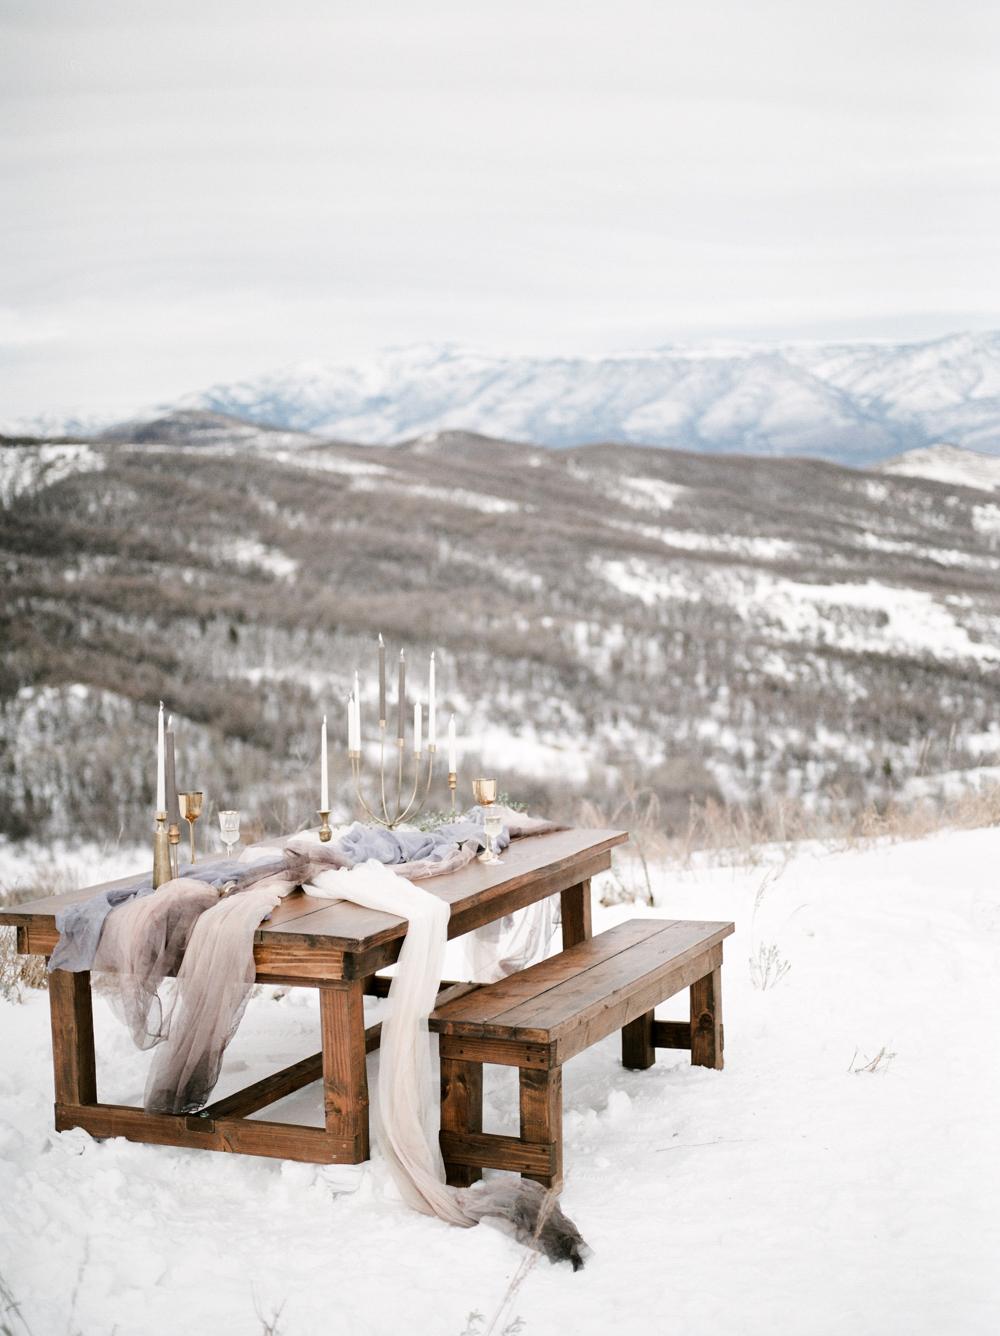 Christine-Gosch-Utah-film-photographer-wedding-mountains-snow-snowy-destination-1.jpg